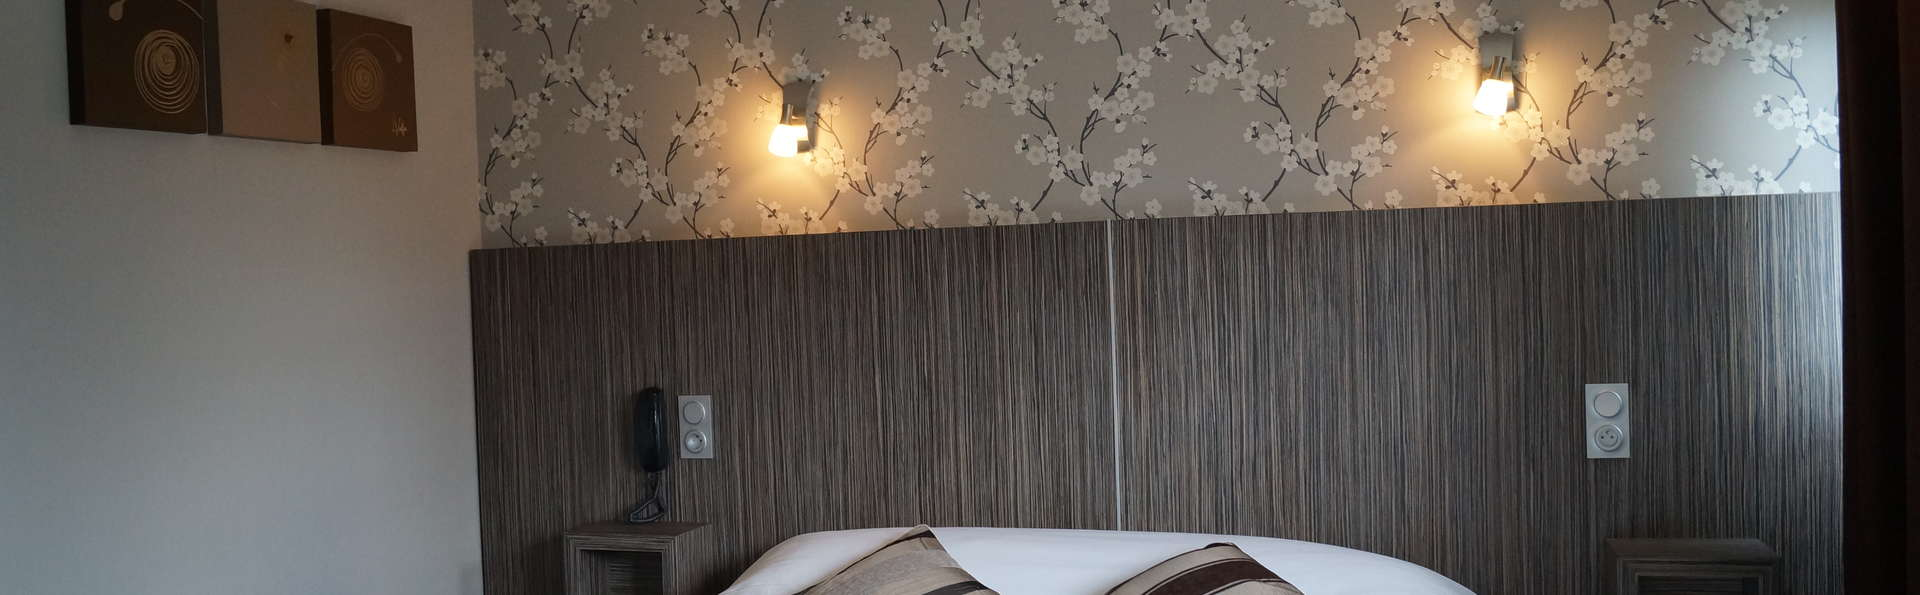 H tel eden saint malo h tel de charme saint malo for Hotel saint malo jacuzzi chambre